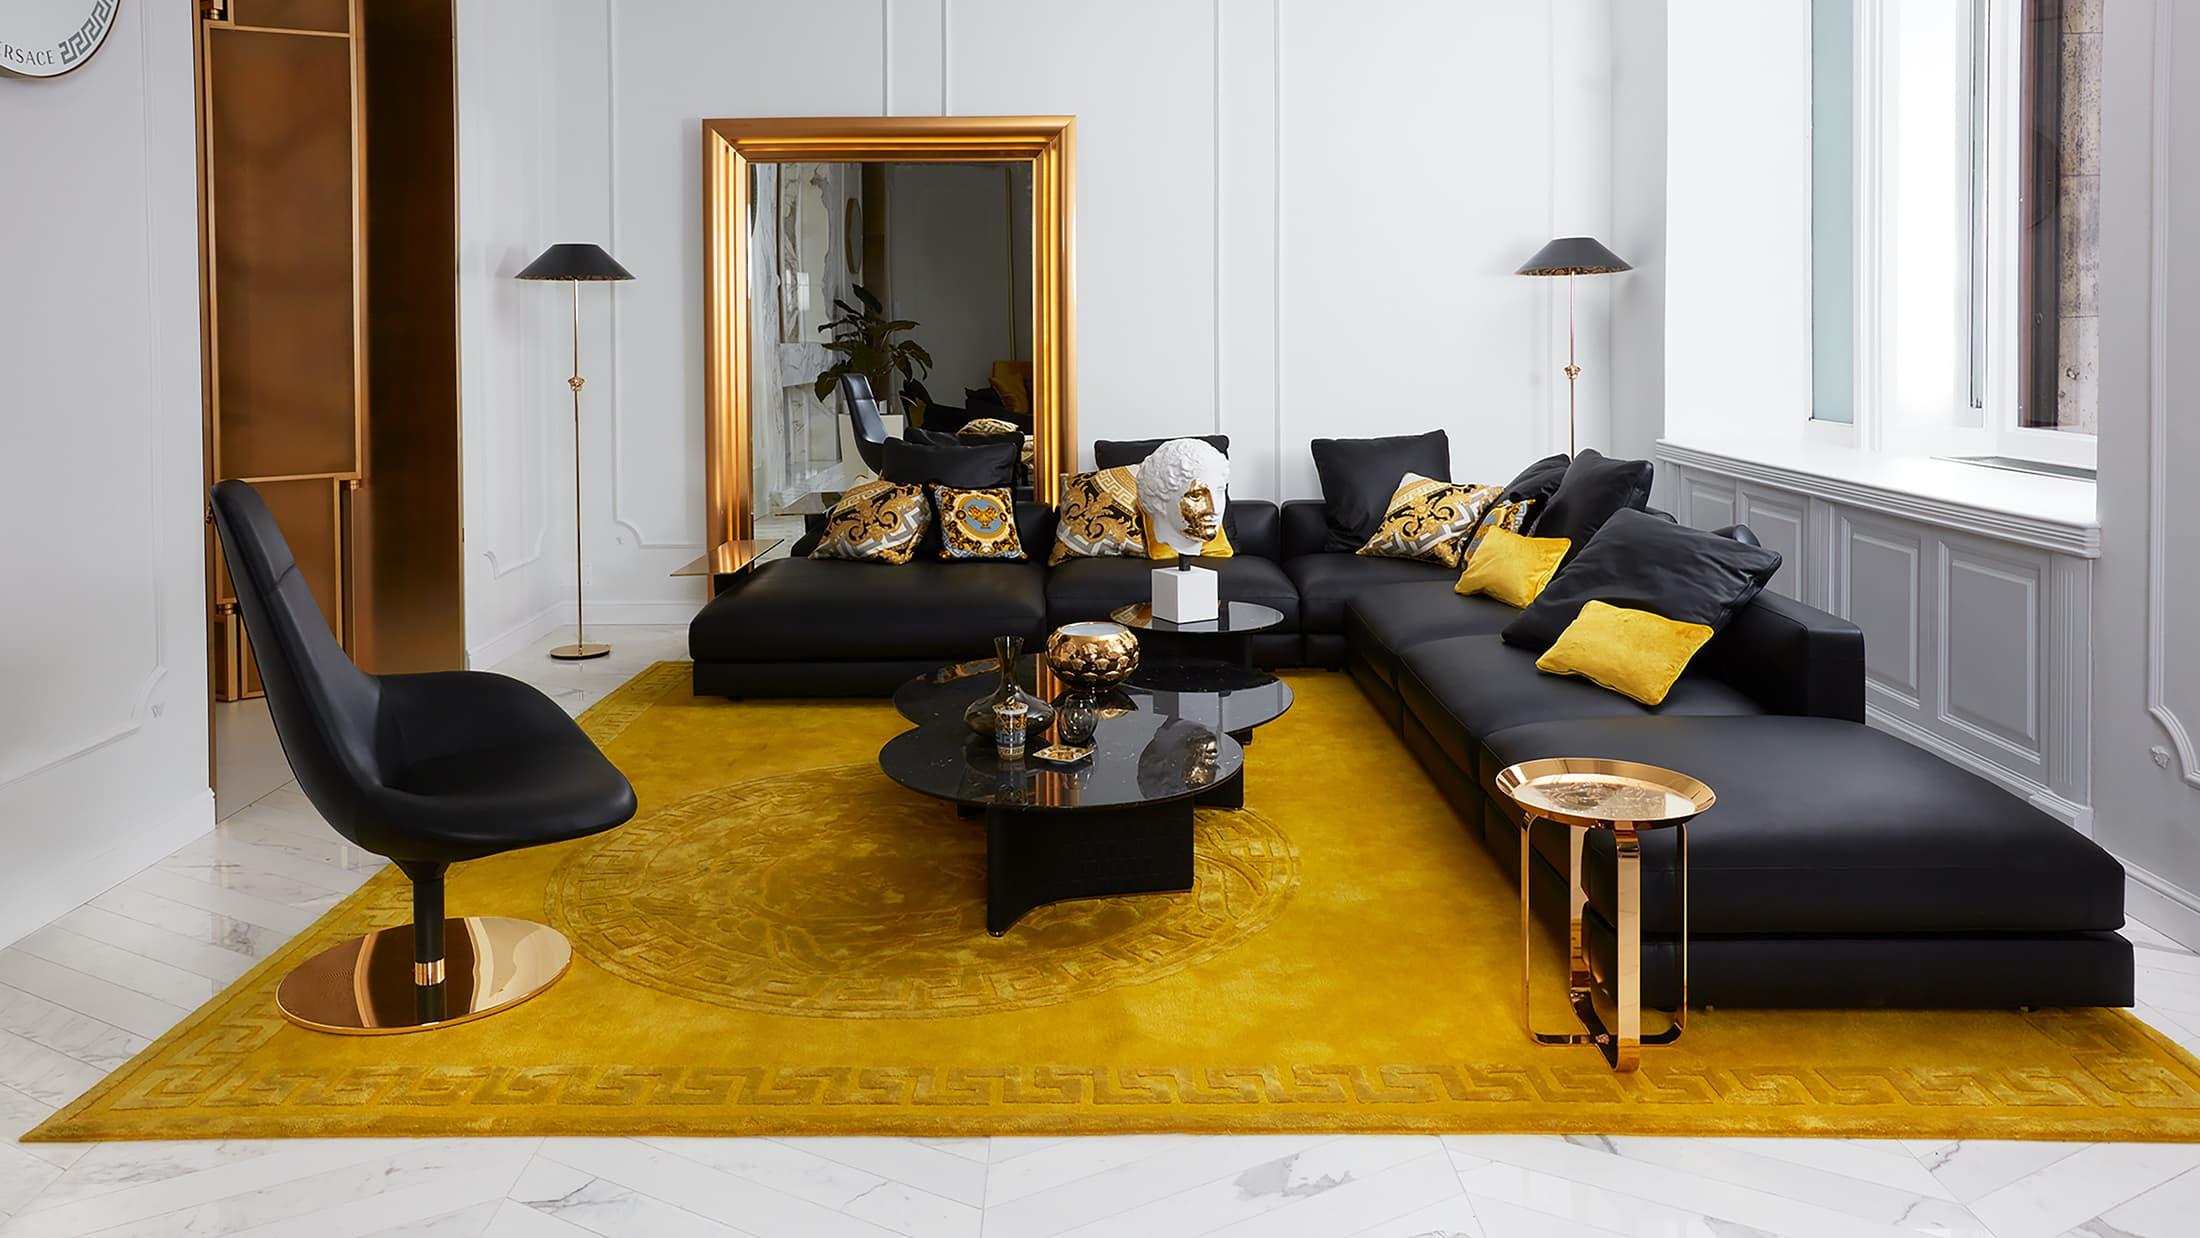 Versace home Spring 2021 Ad Campaign Photos